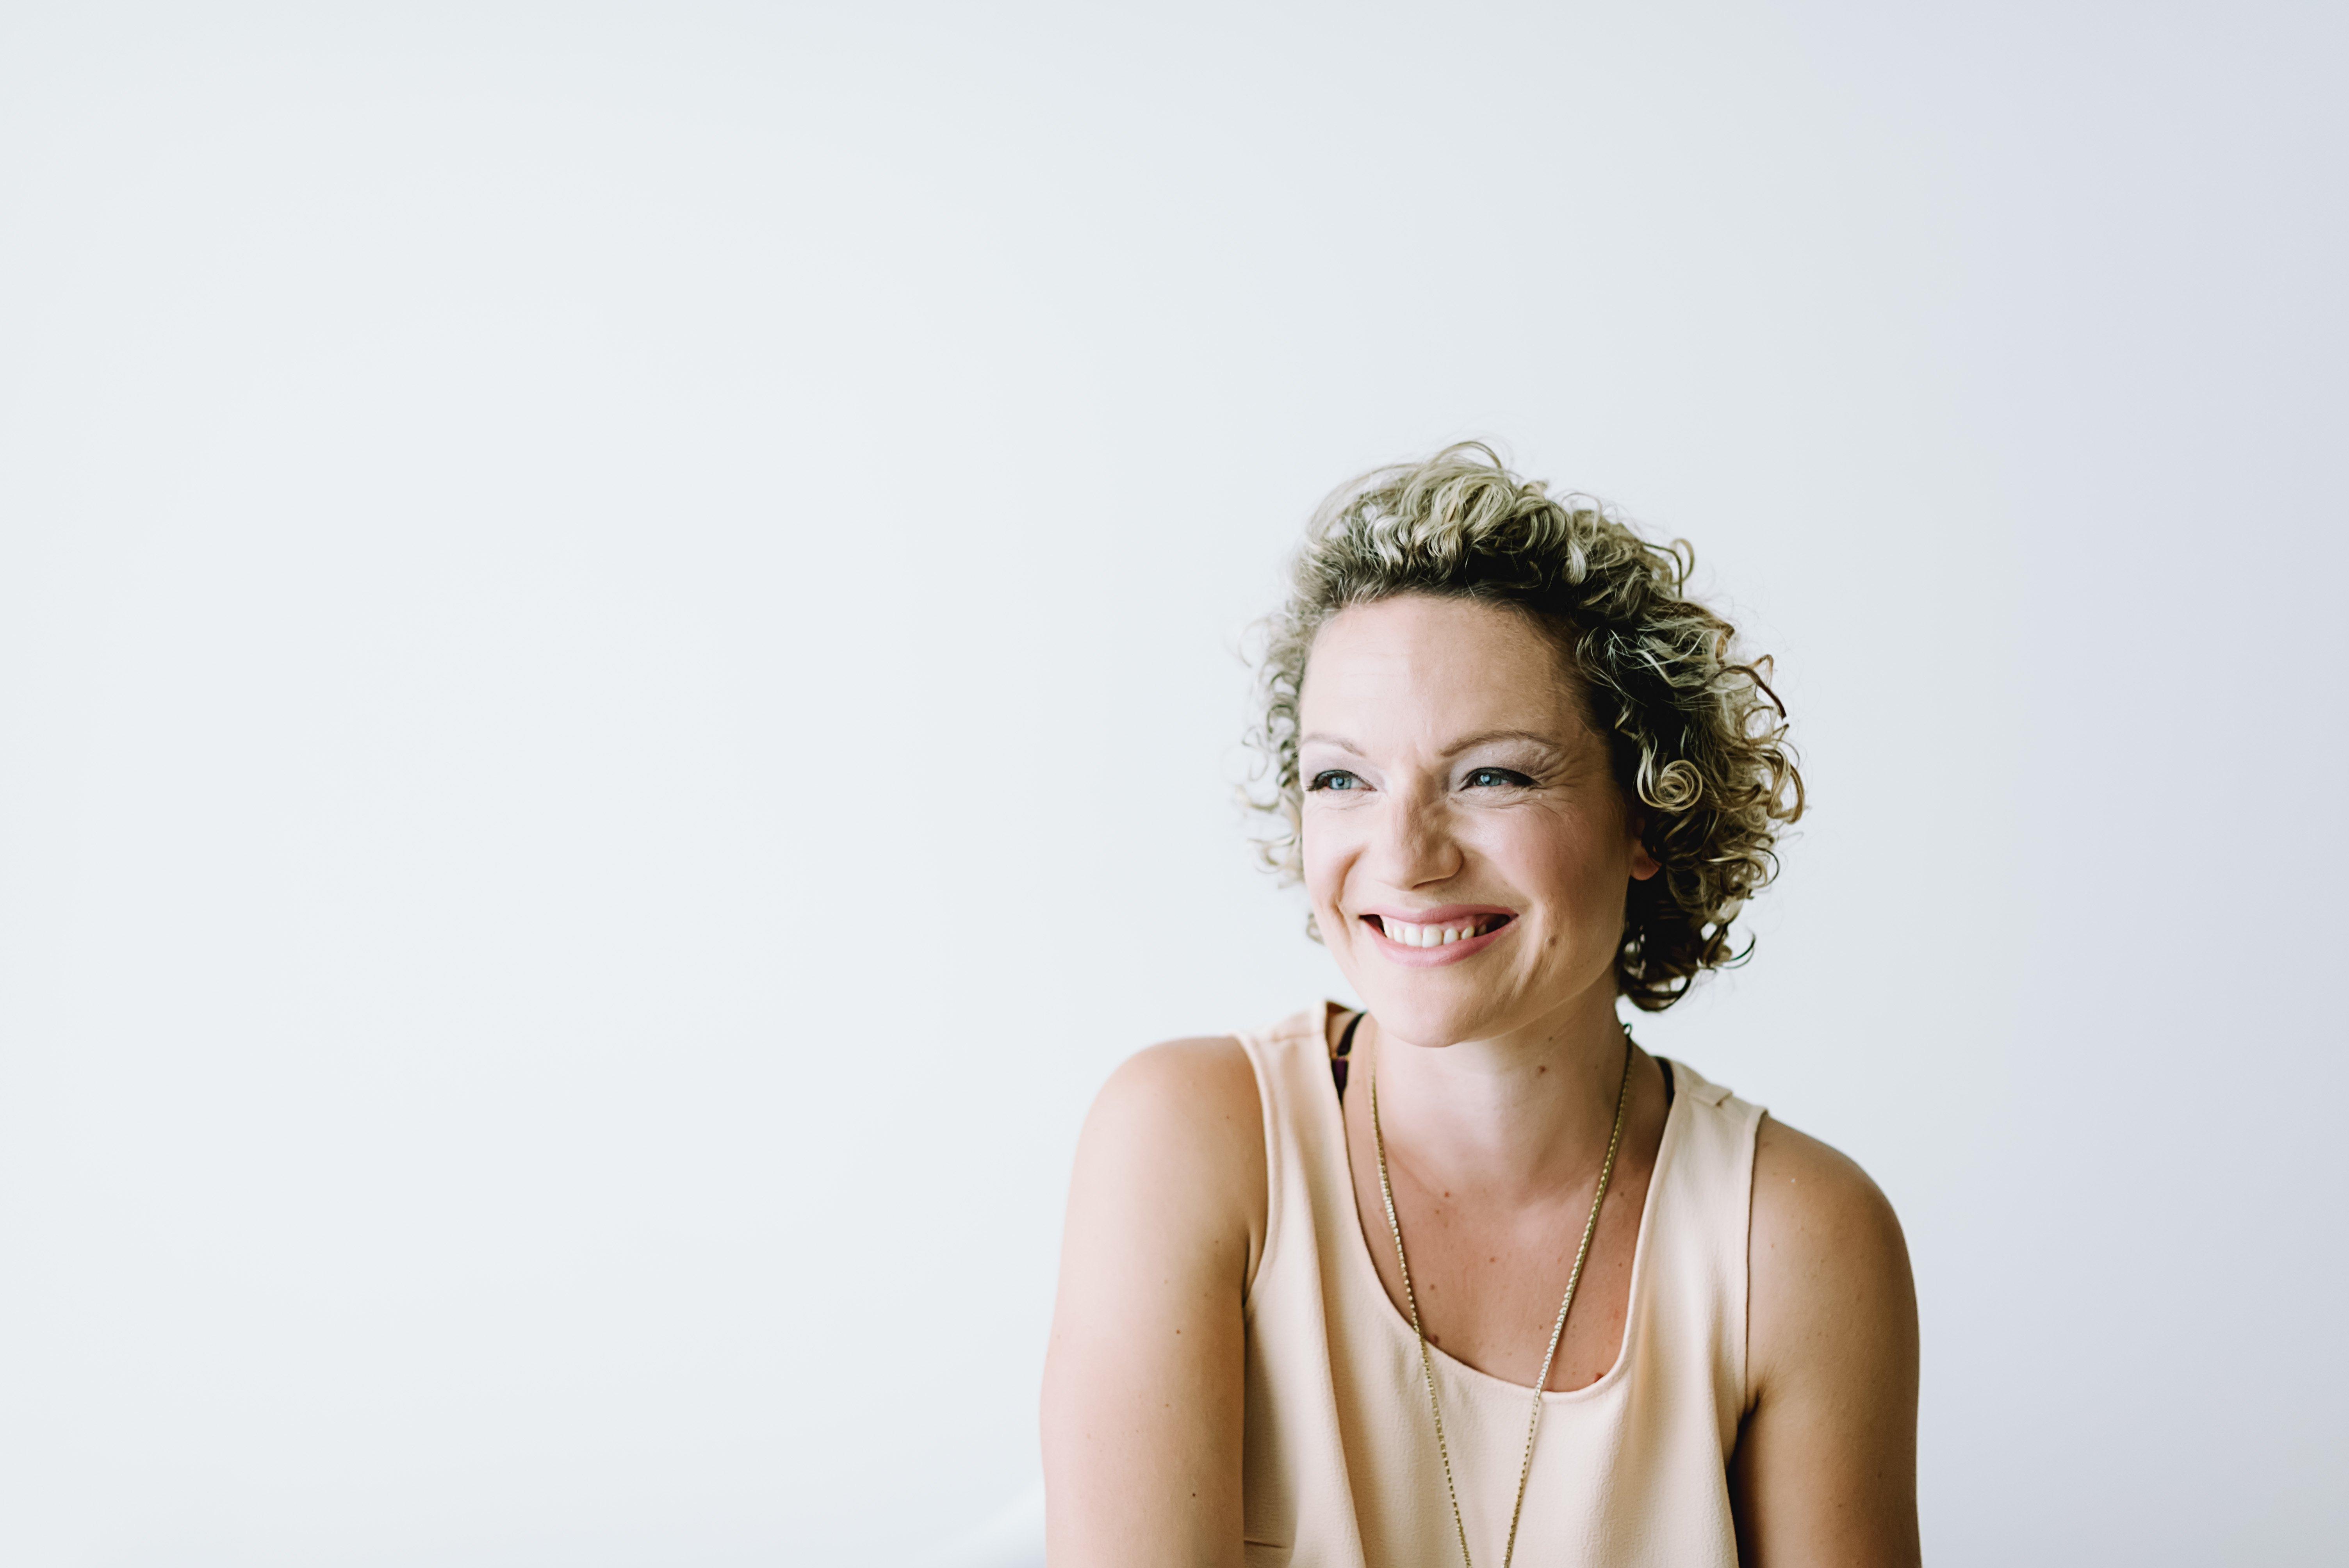 Portrait of Evamaria Kulovits, TripShooter Amsterdam photographer